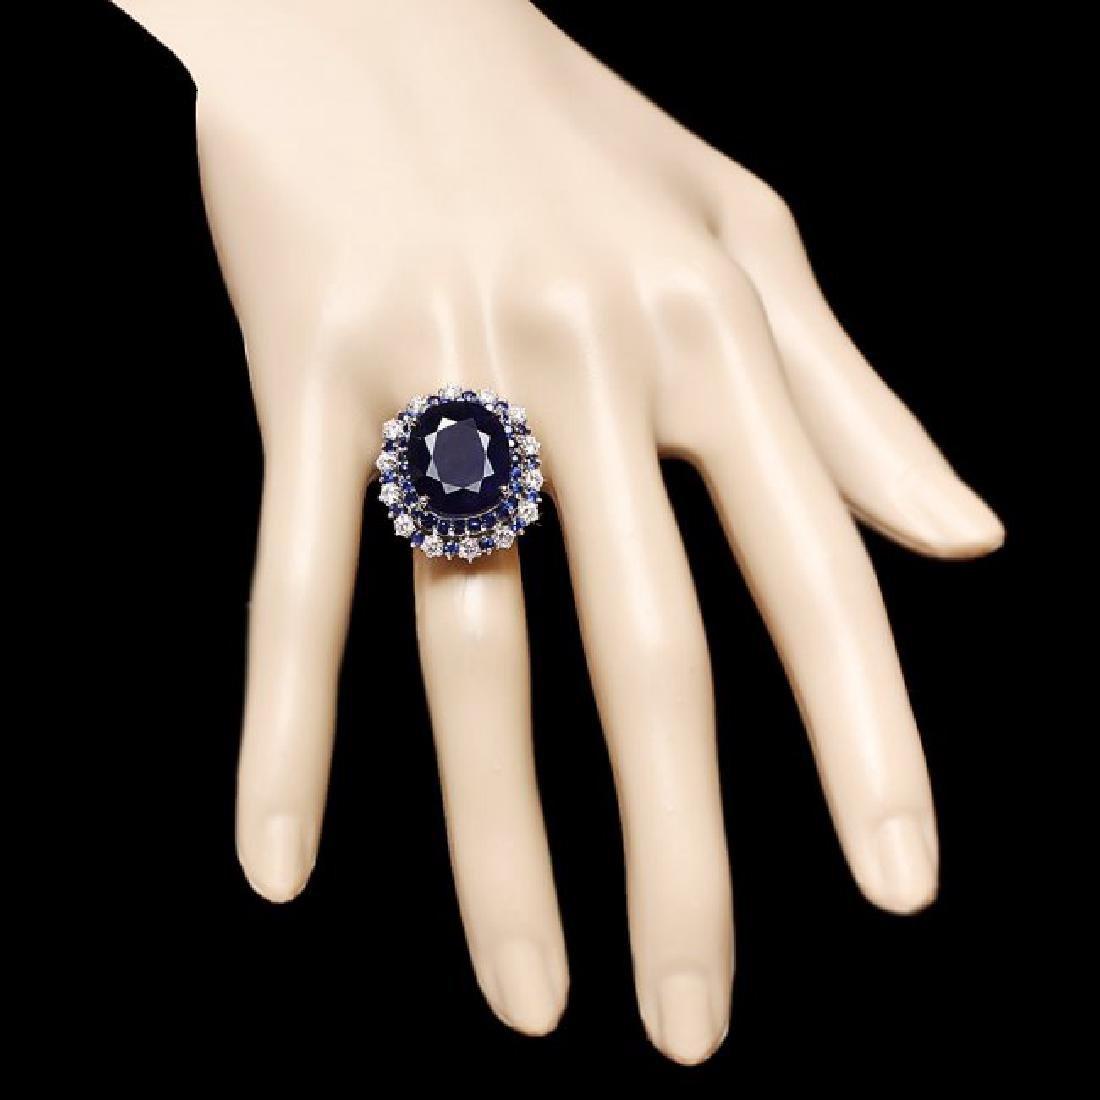 14k Gold 16.4ct Sapphire 1.00ct Diamond Ring - 4